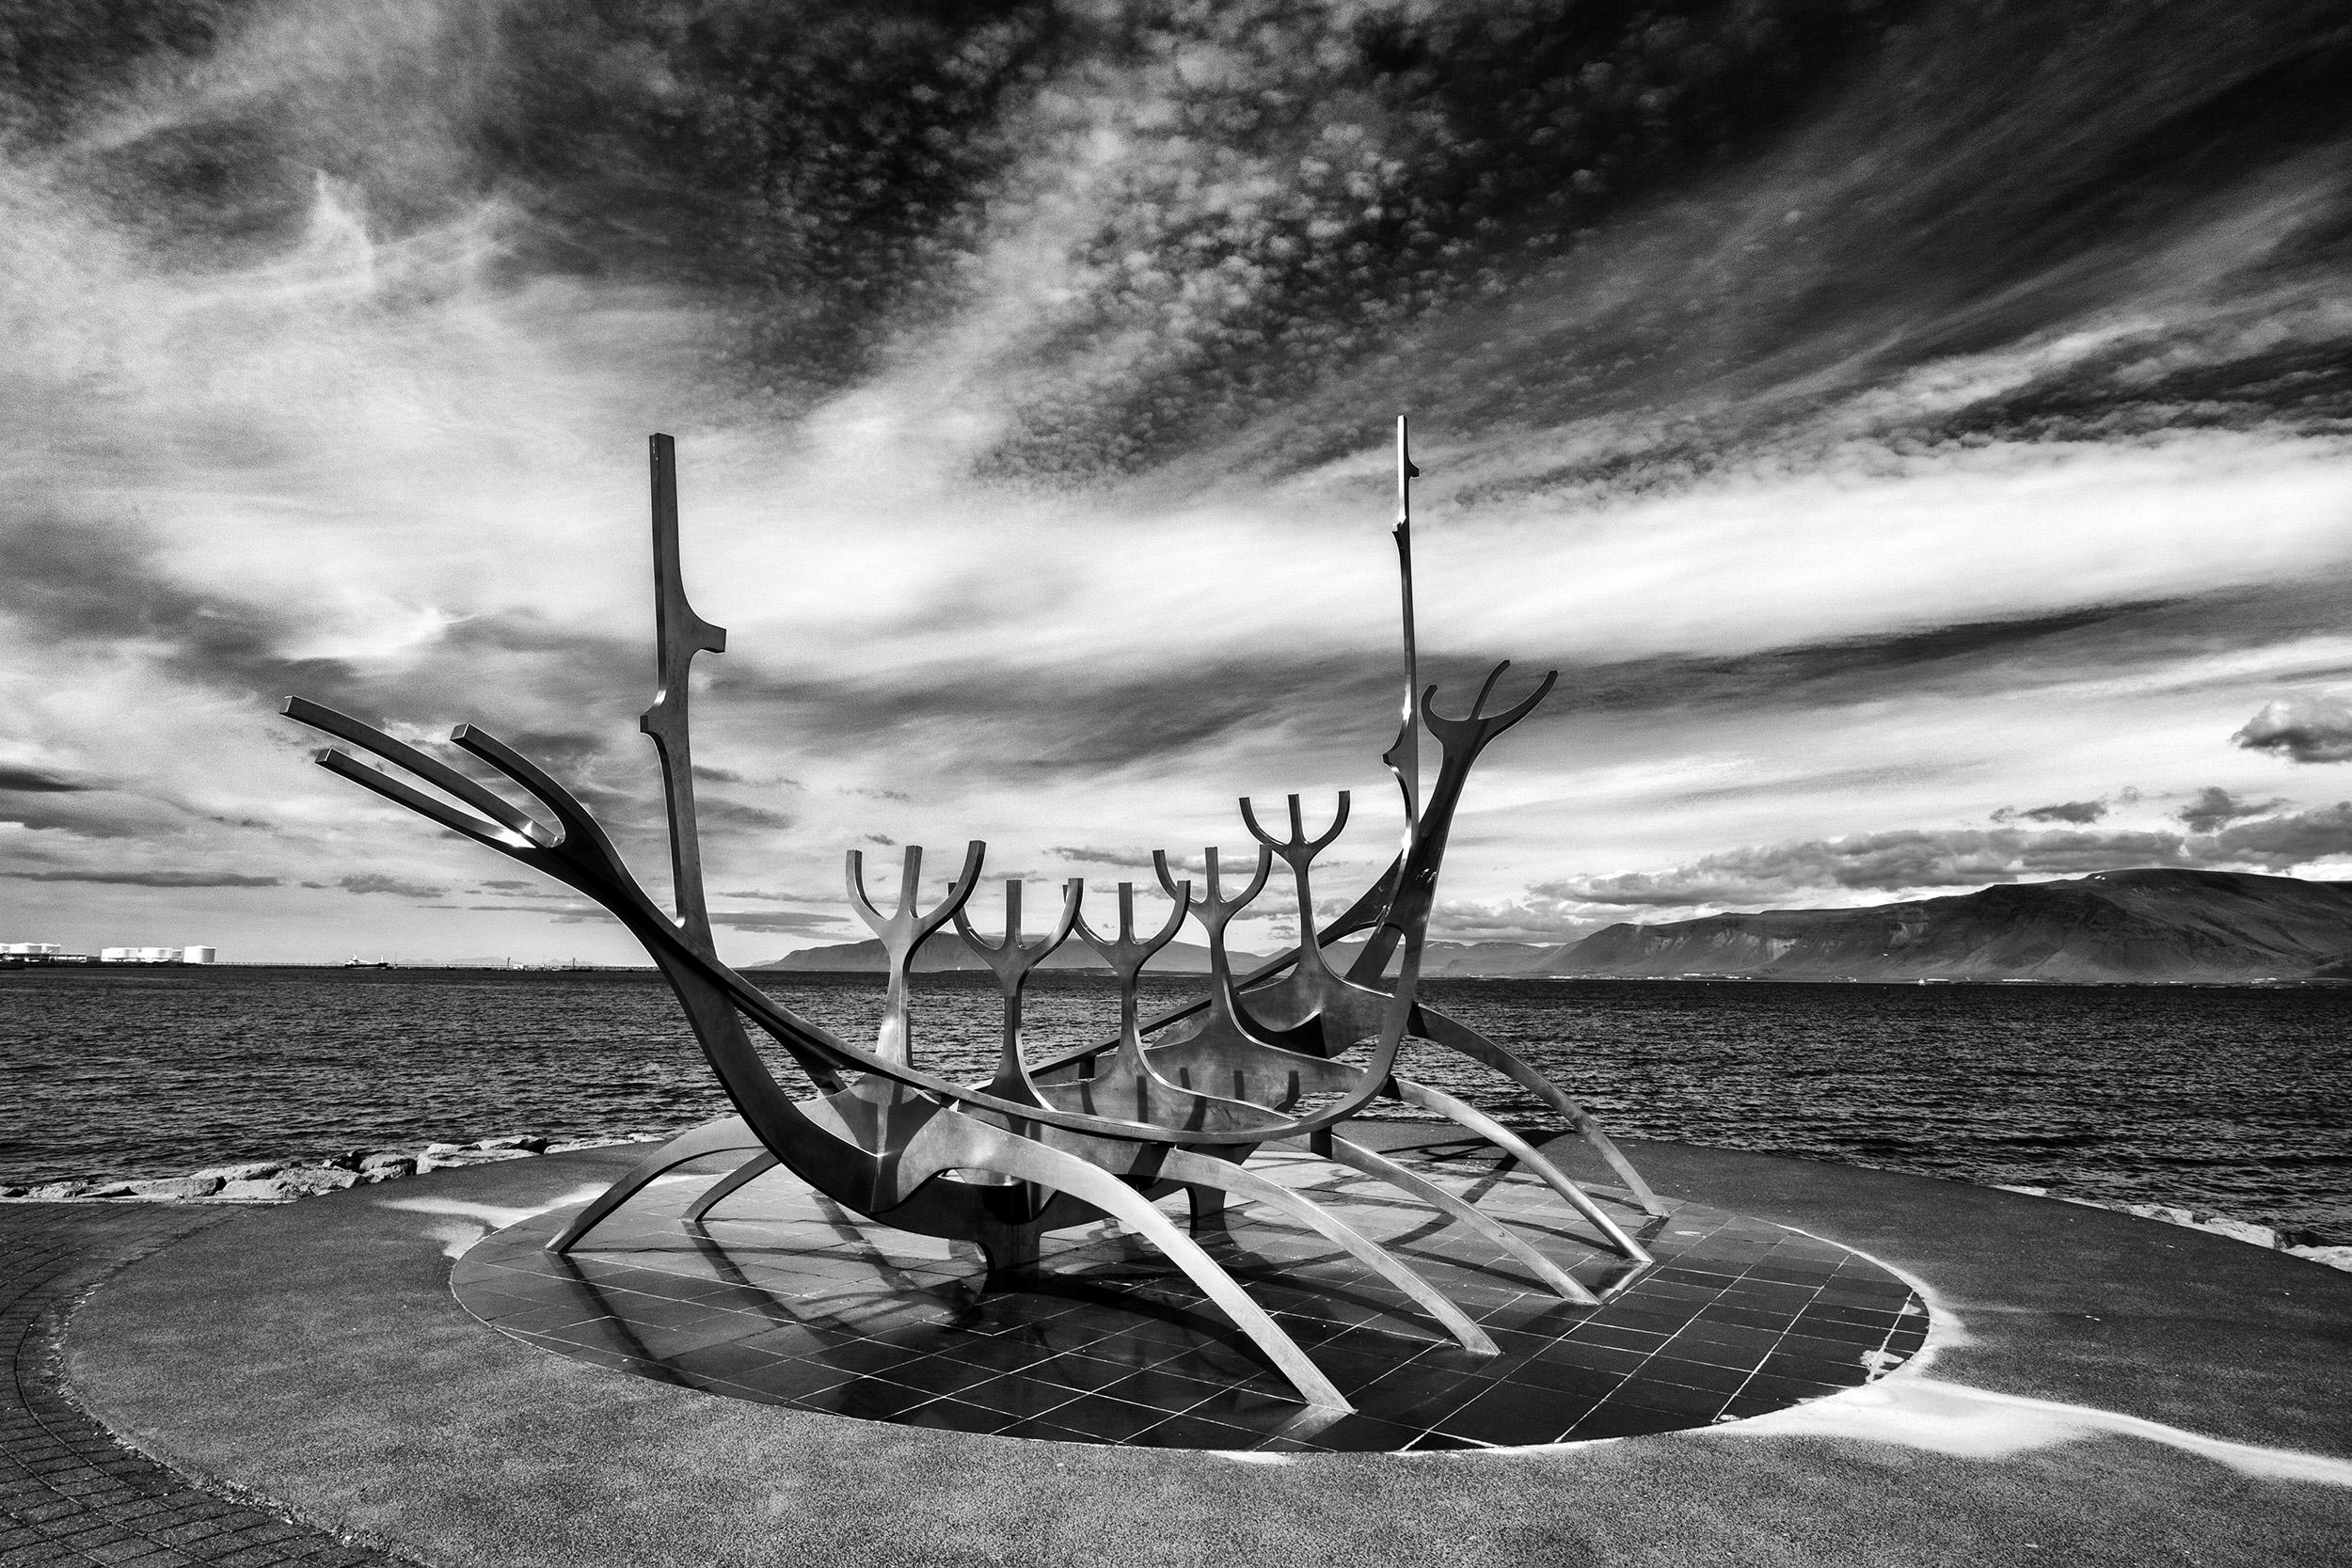 The Sun Voyager, Reykjavik